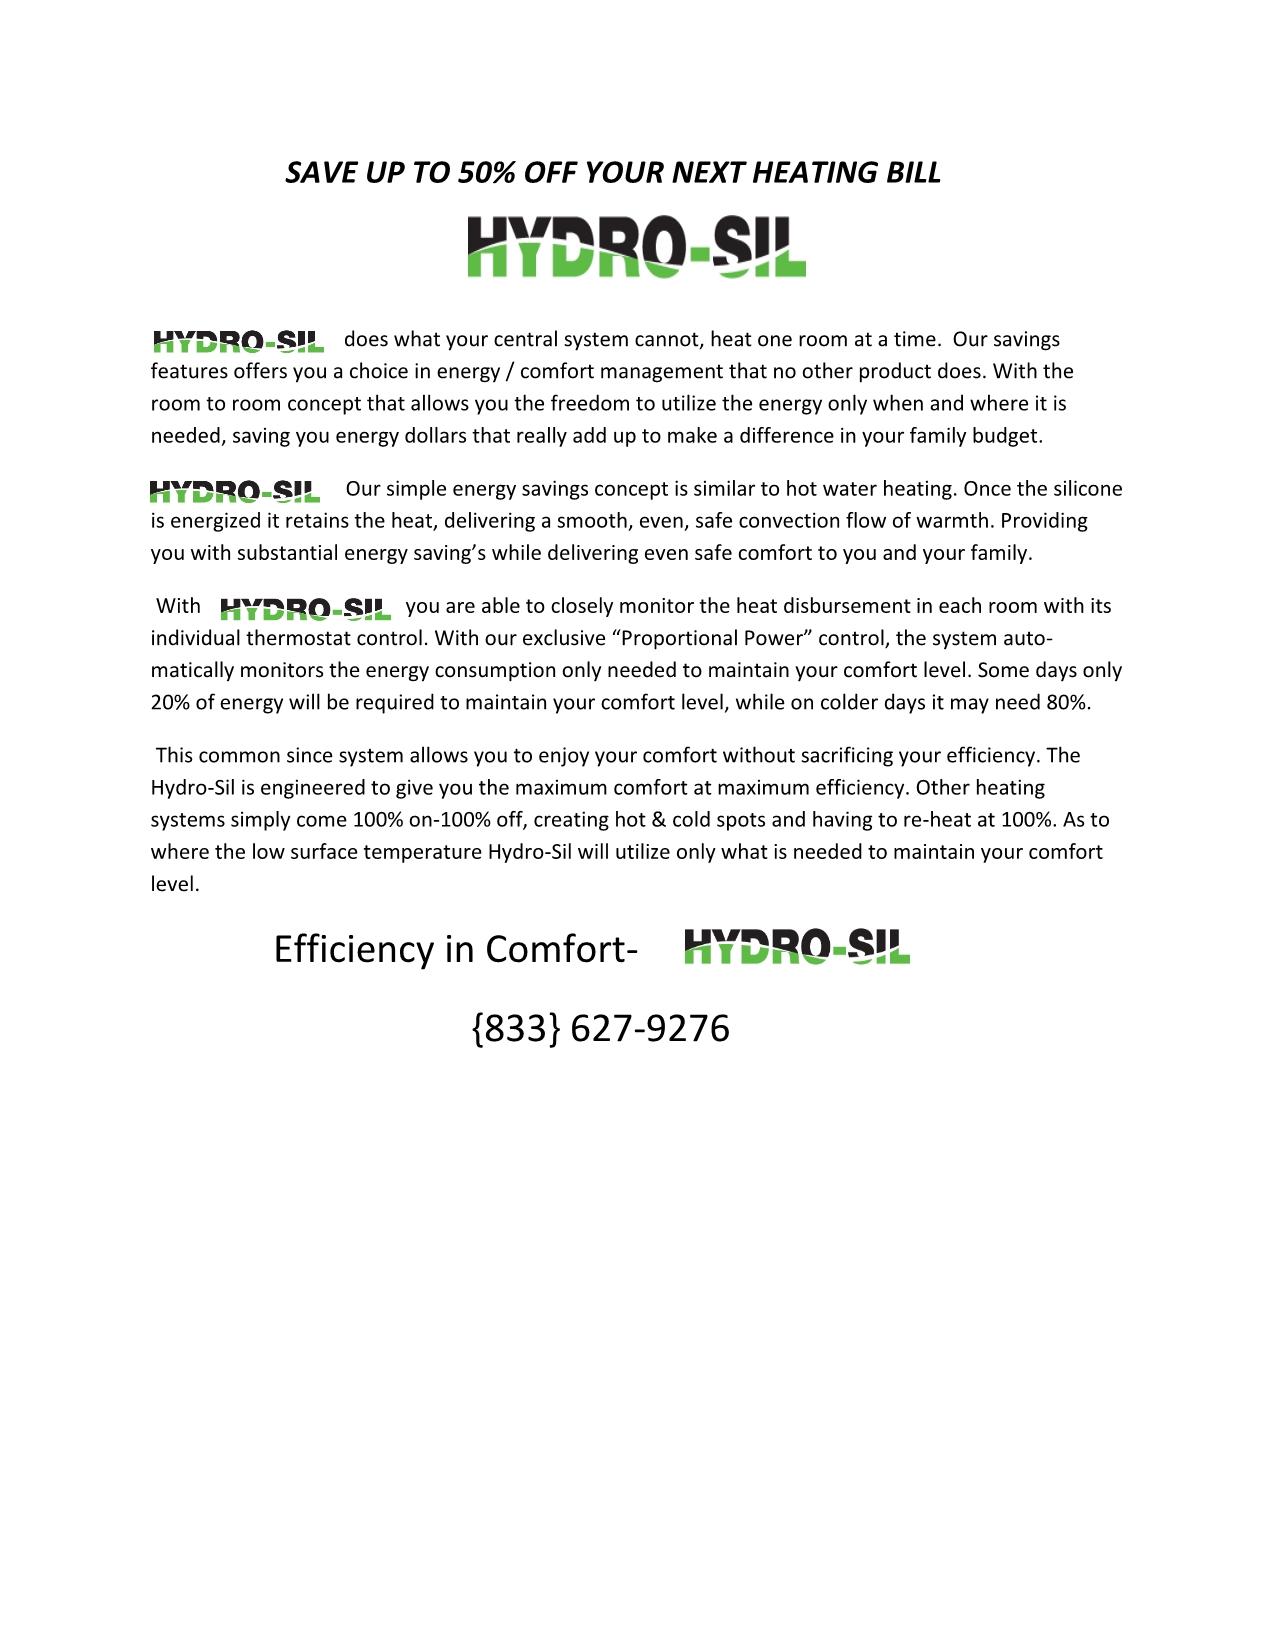 save-up-to-50-hydrocomfo-1-.jpeg